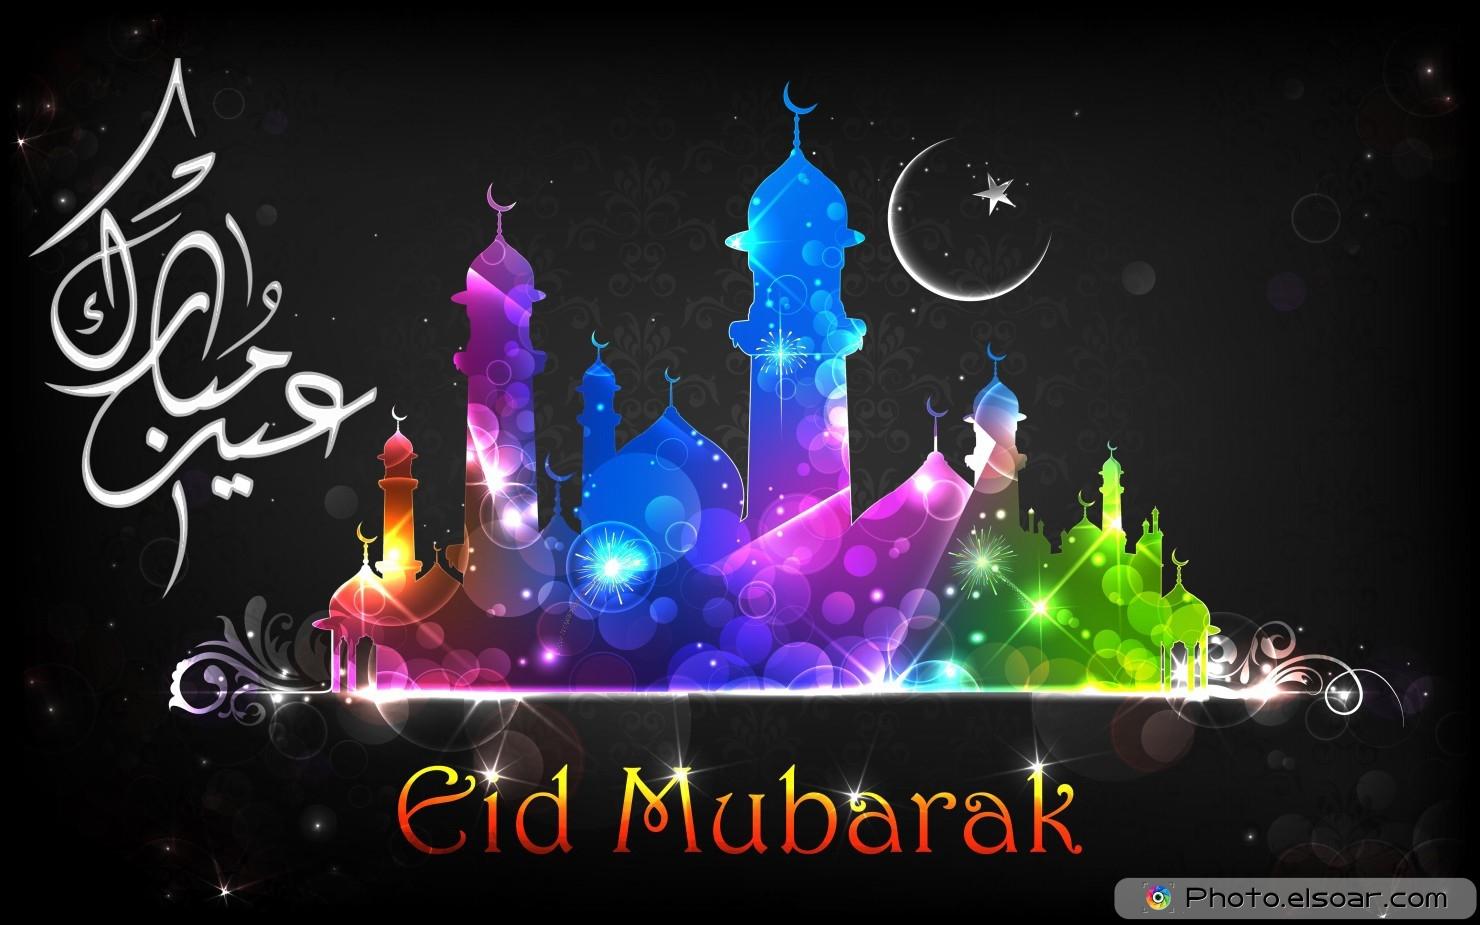 Wallpaper download eid - Eid Mubarak Wallpaper Hd Free